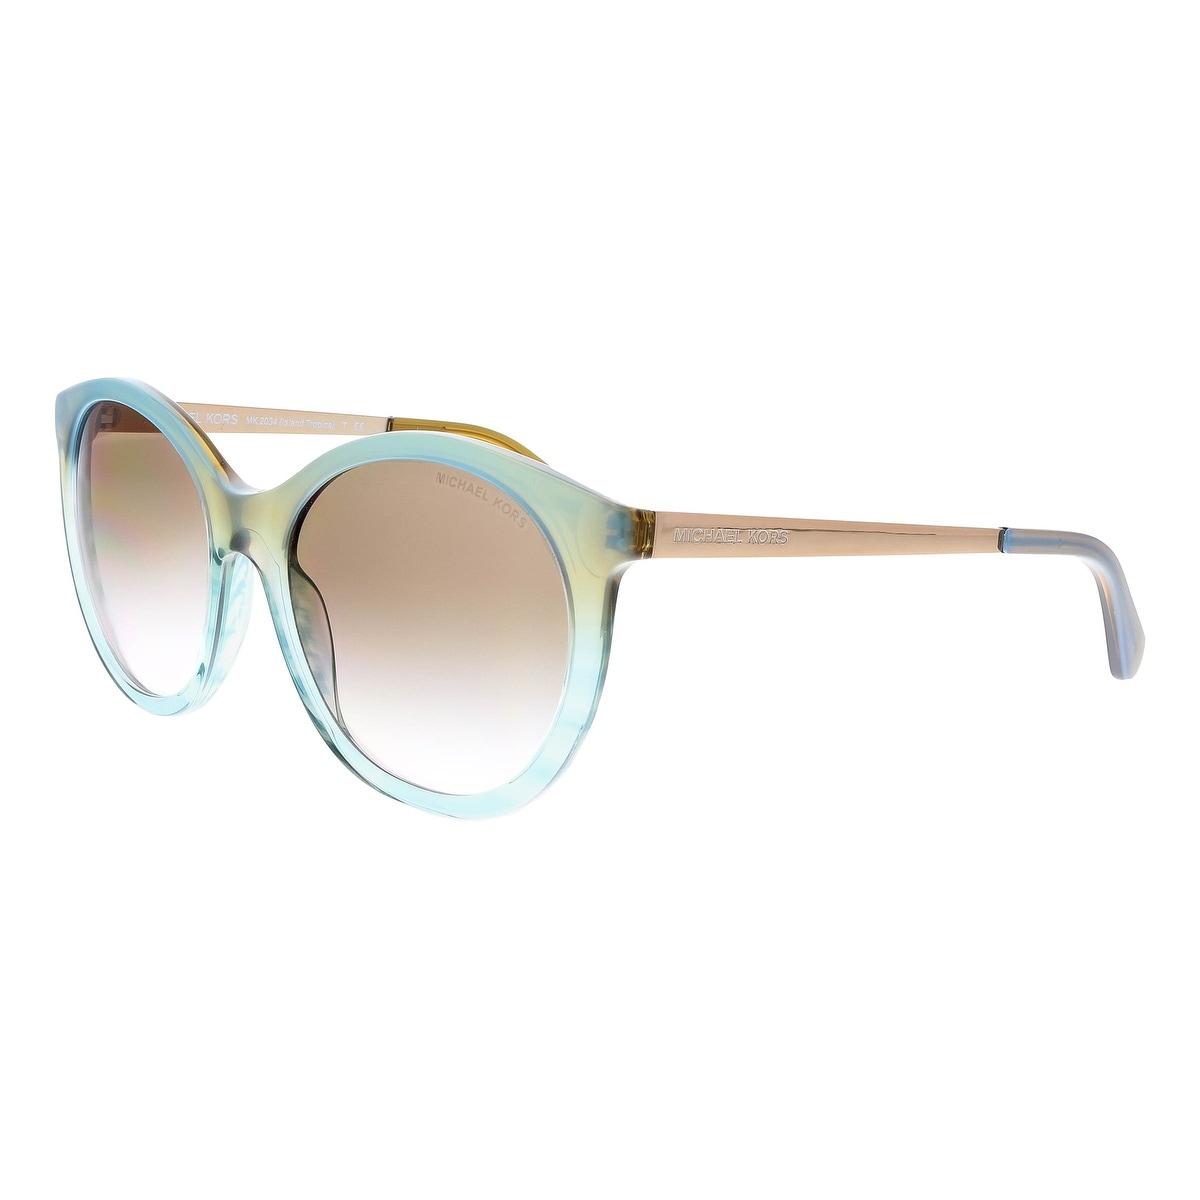 95f50301d8 Round Michael Kors Women s Sunglasses